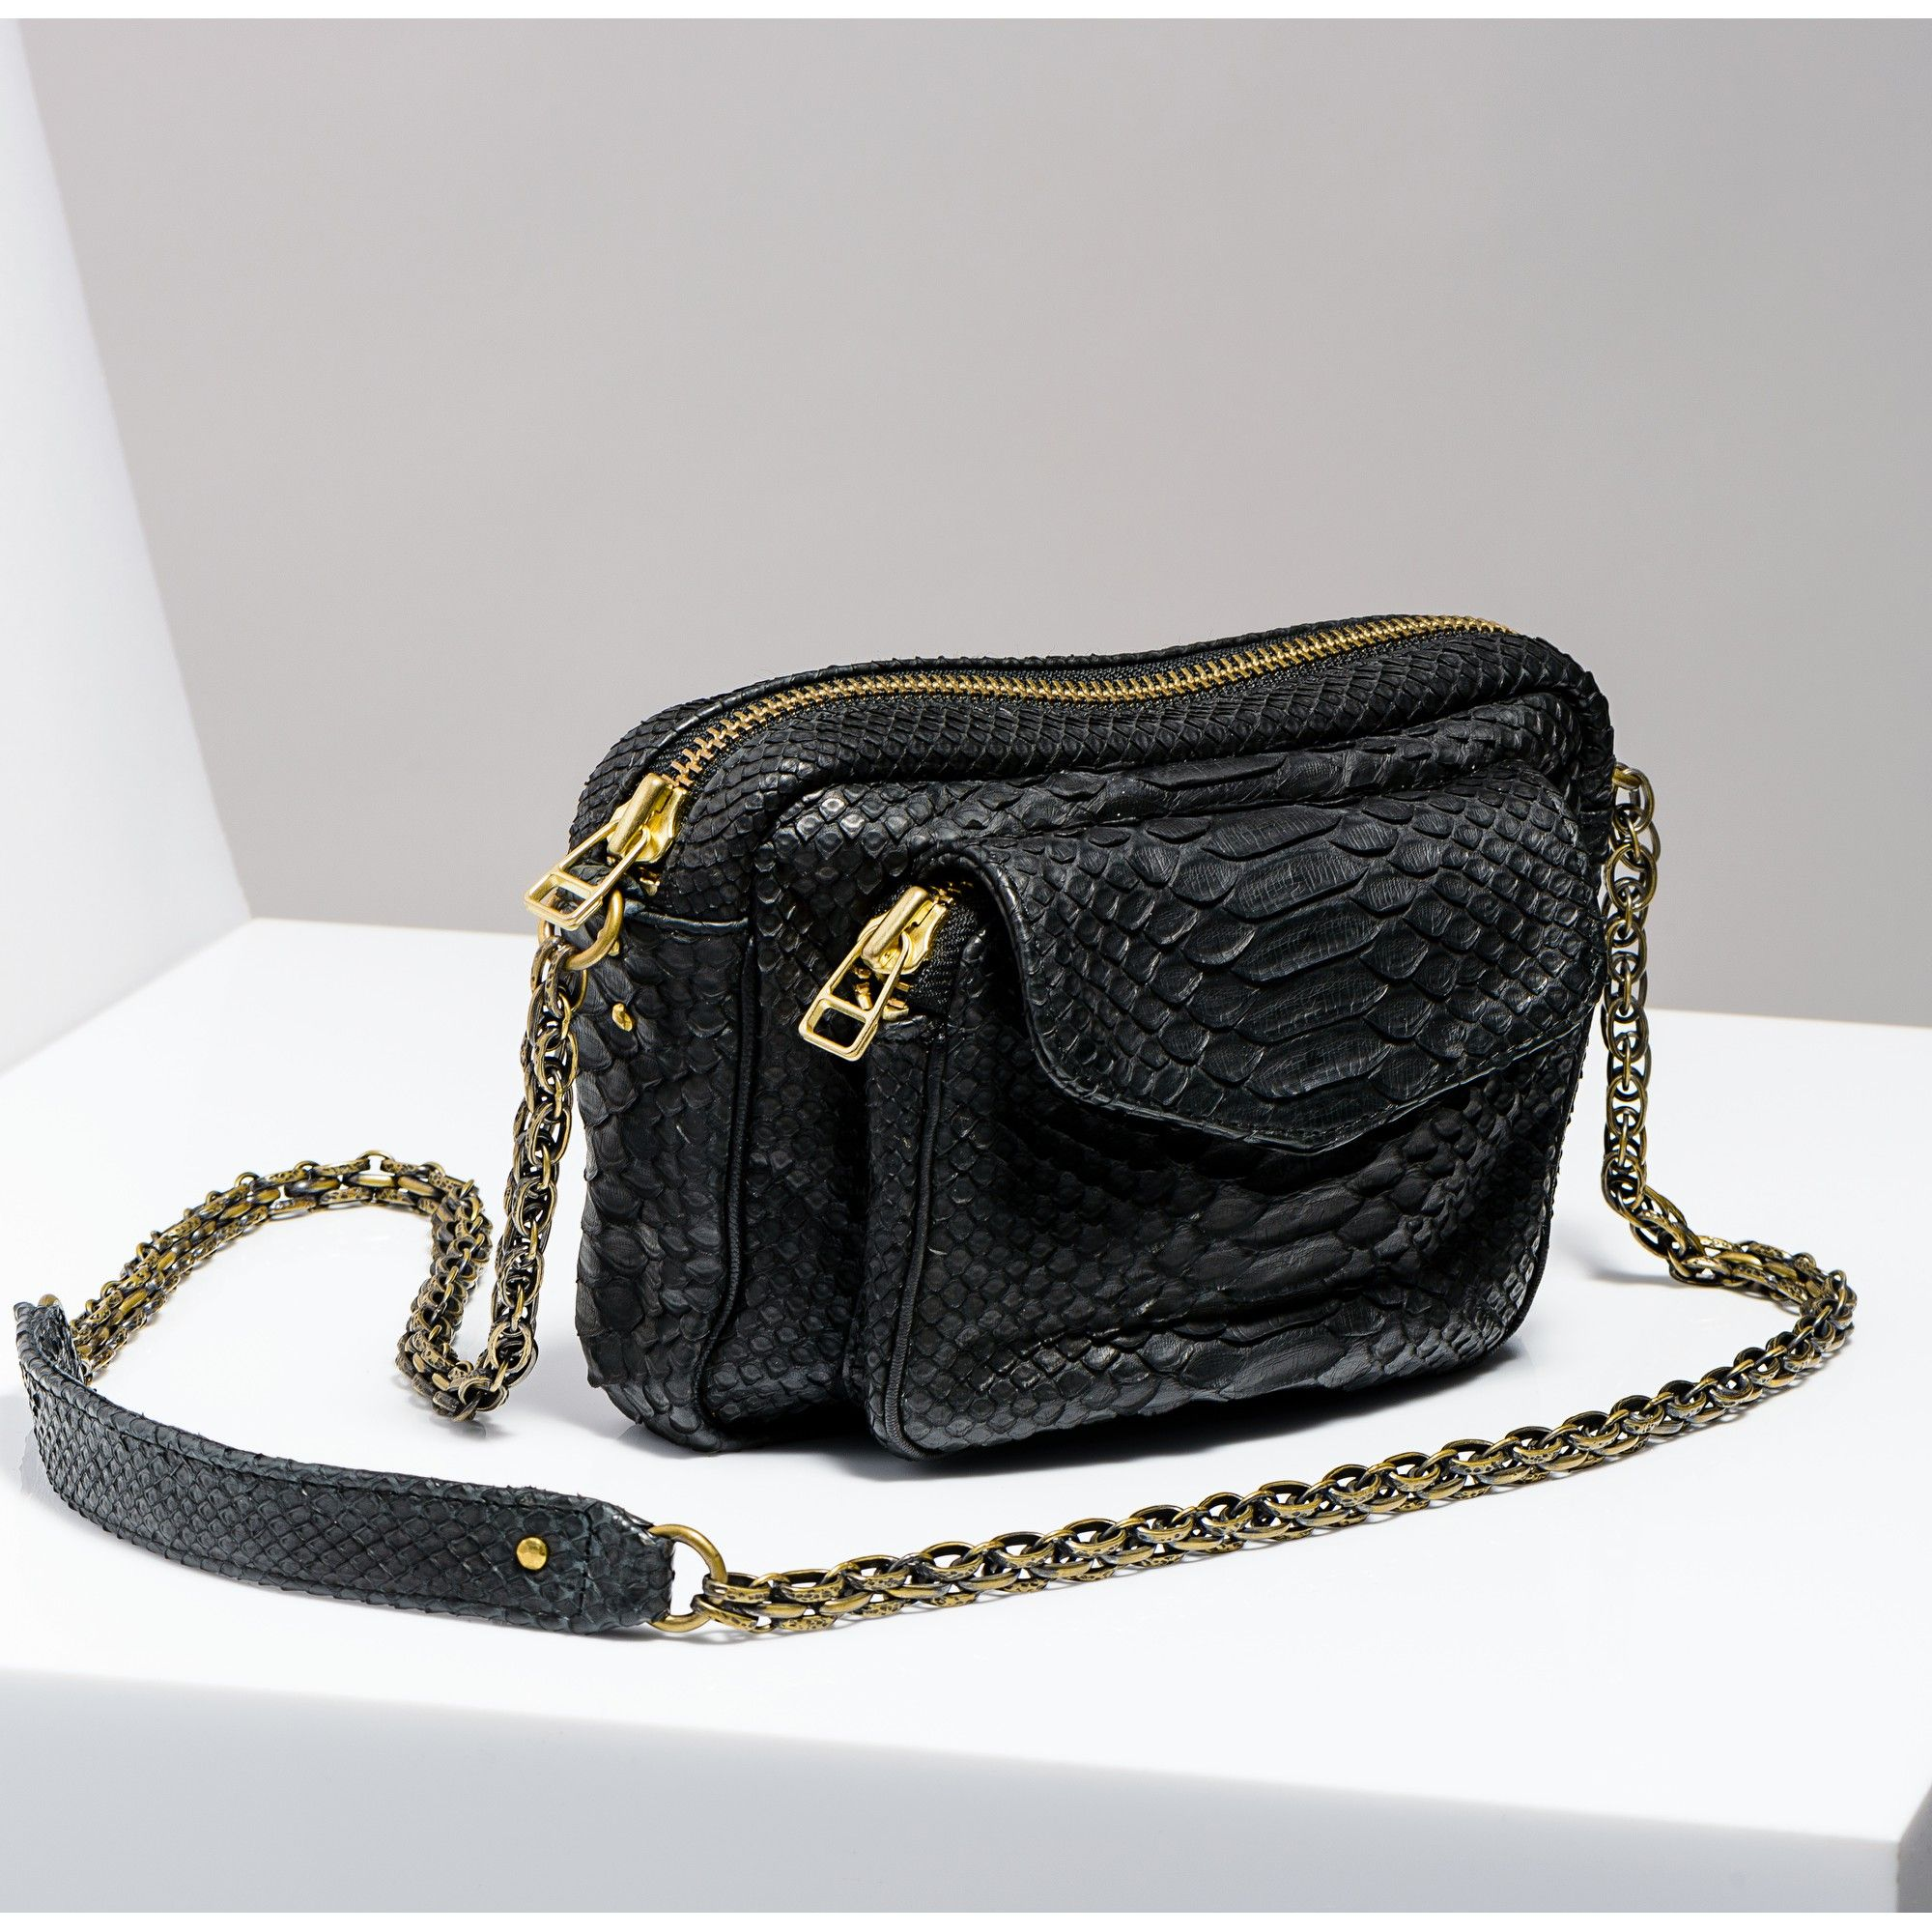 Bien connu Sac bandoulière charly noir Python | Fashion | Pinterest MD03